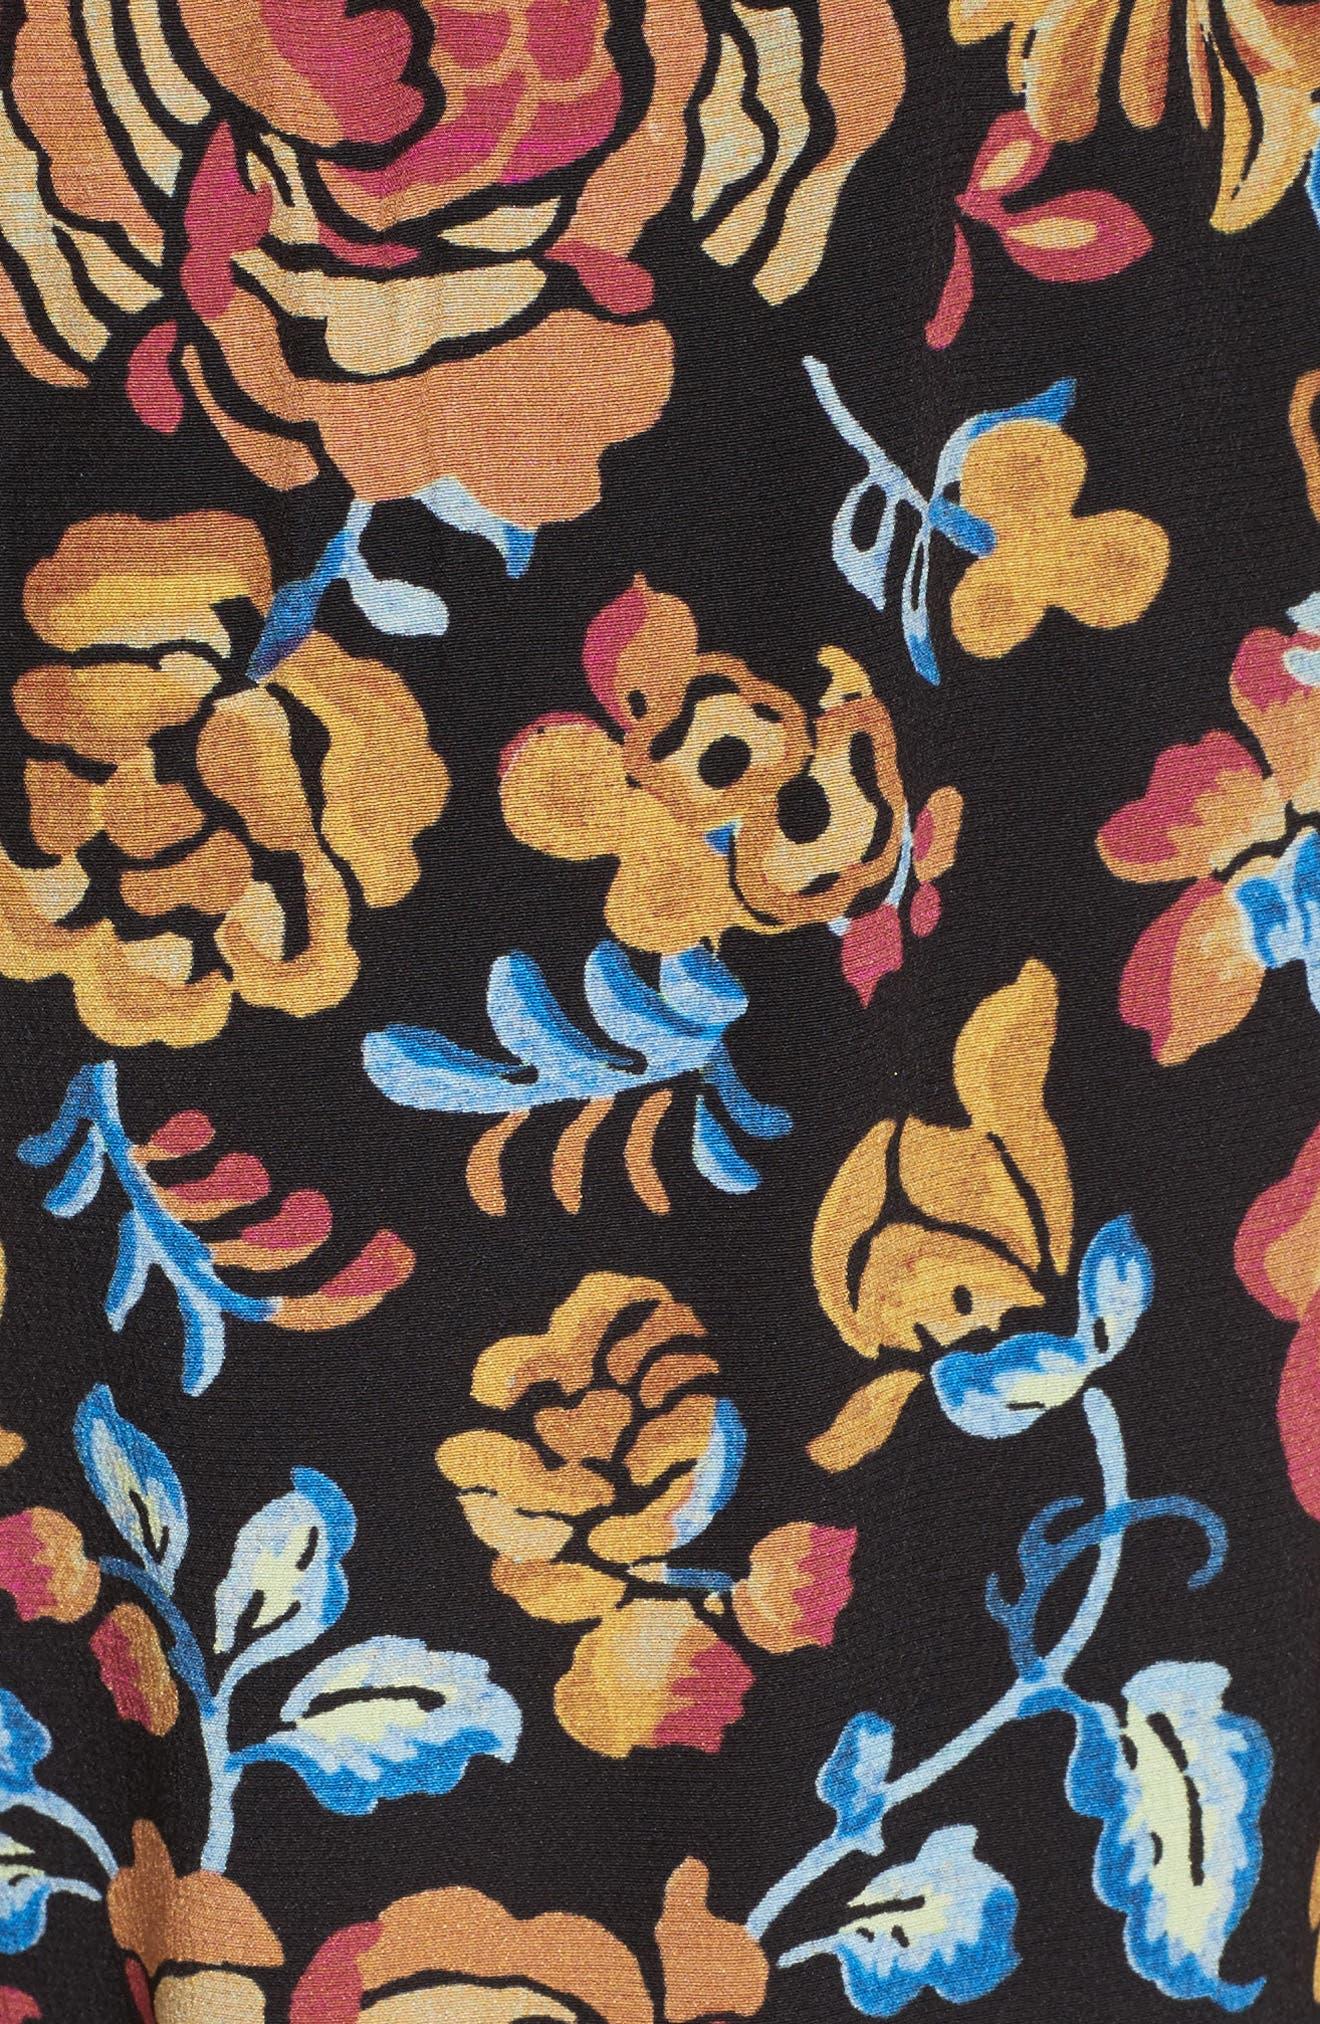 Floral Print Silk Pants,                             Alternate thumbnail 5, color,                             001